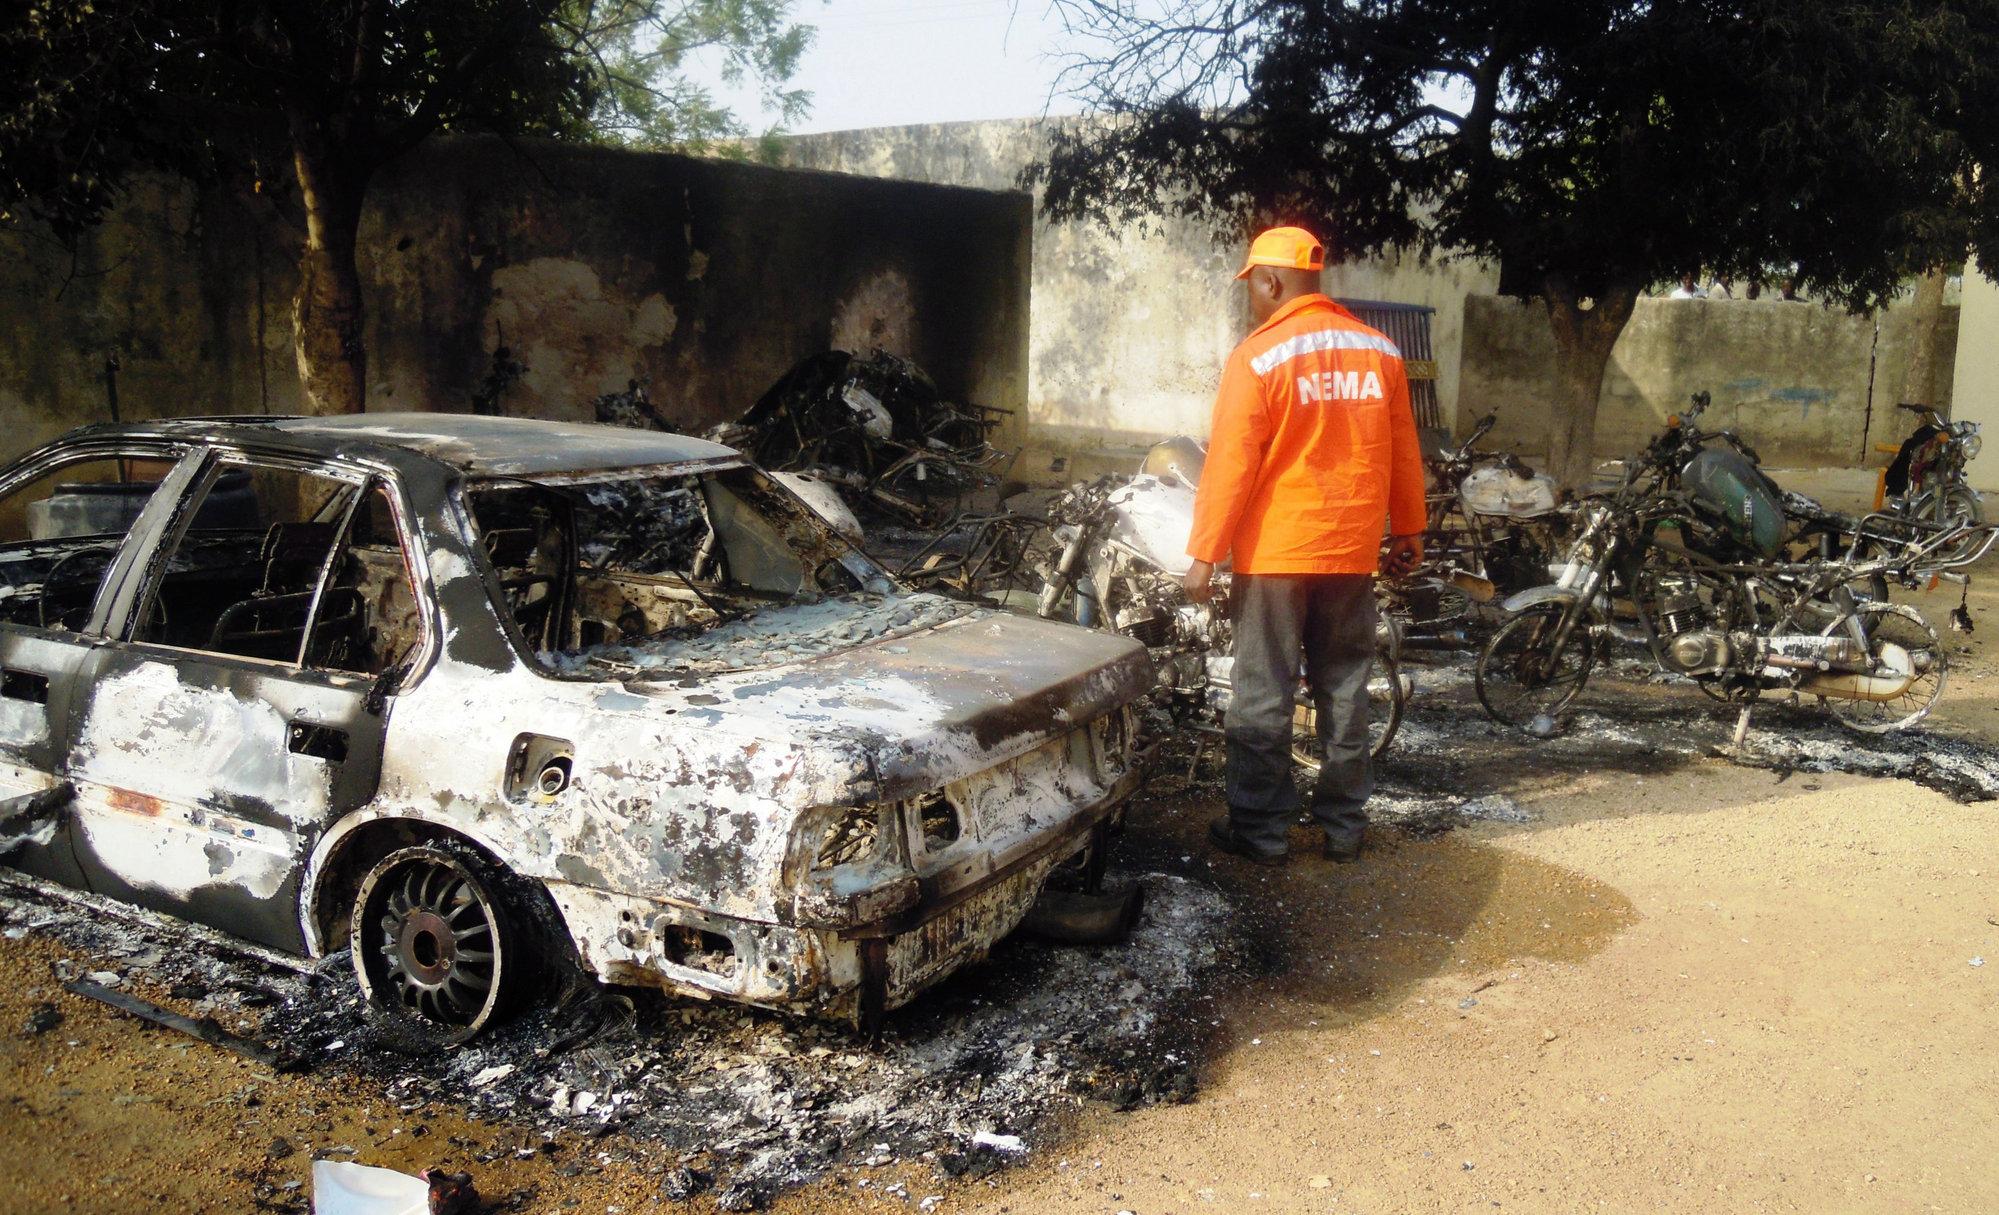 Abaten a ocho miembros de la secta Boko Haram que querían atentar en un mercado